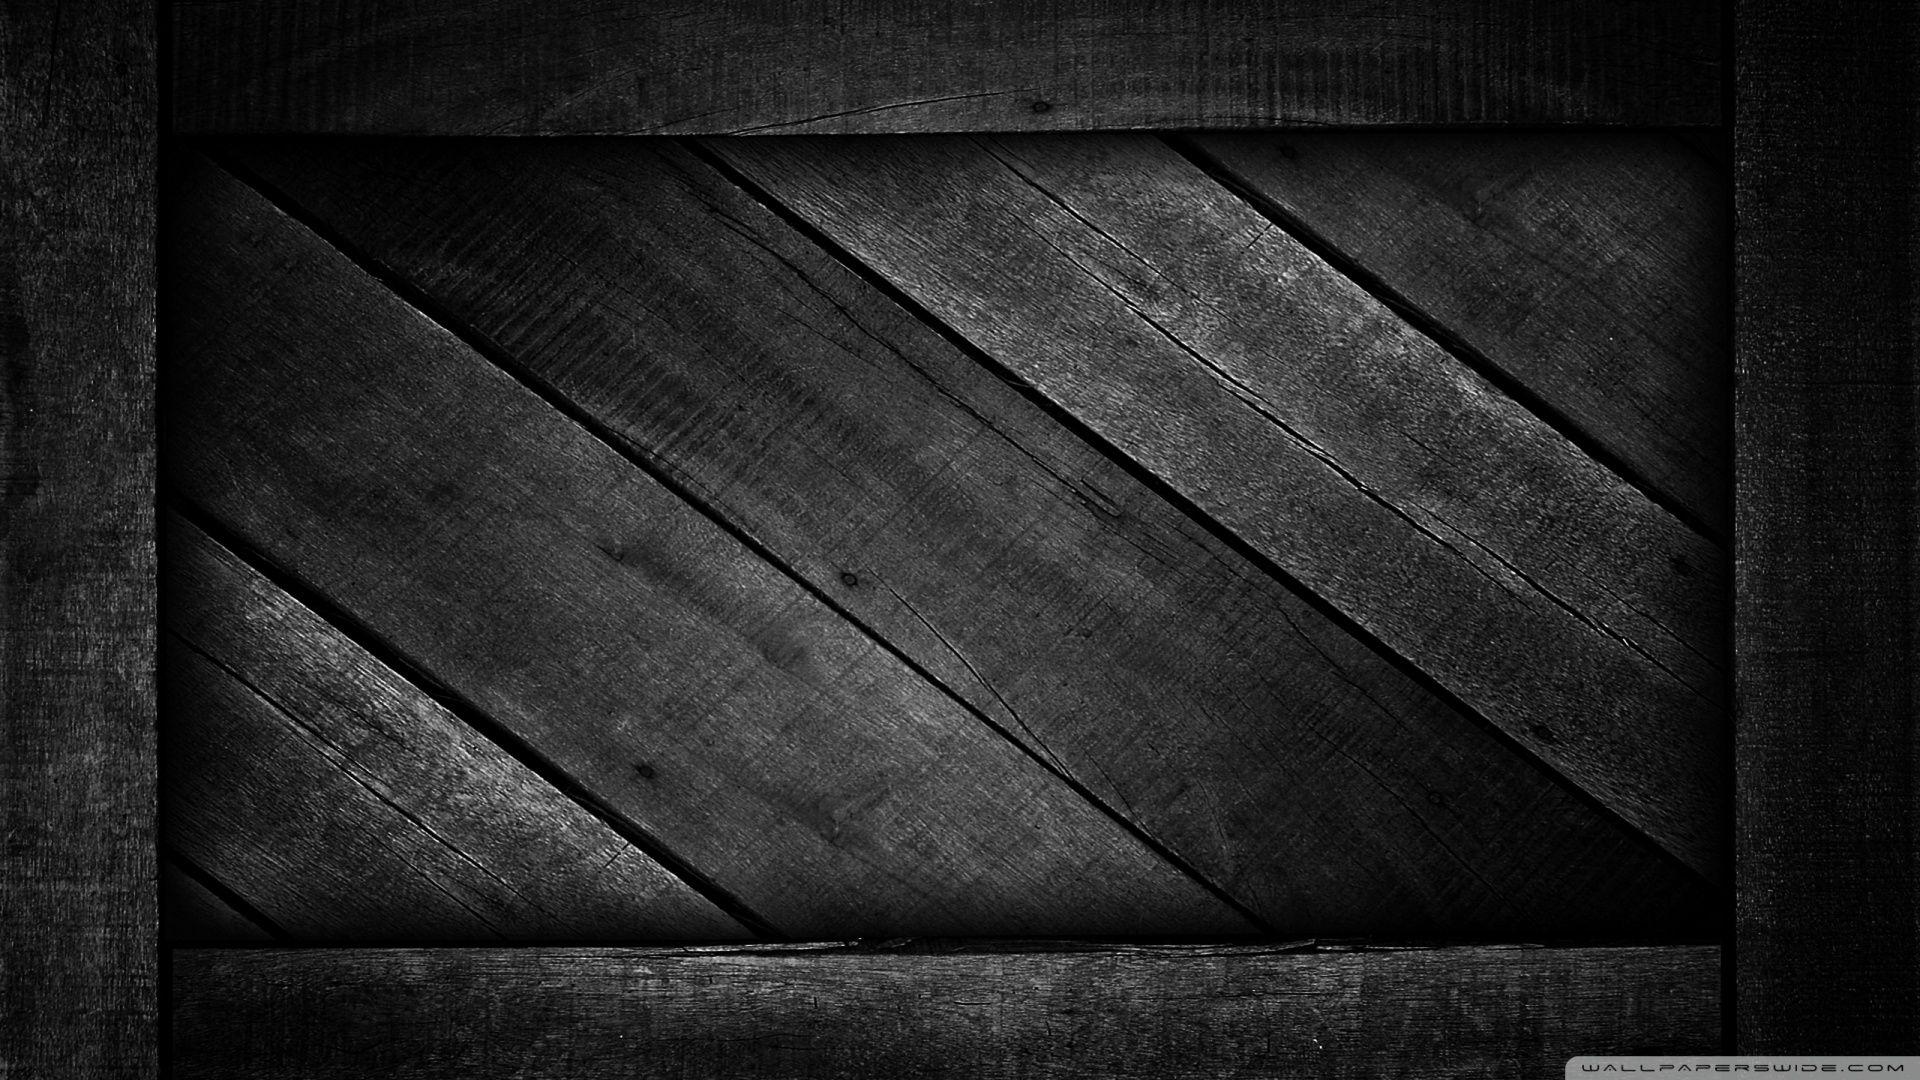 Black Background Iphone 7 Best Wallpaper Hd Black Wood Floors Floor Wallpaper Dark Phone Wallpaper